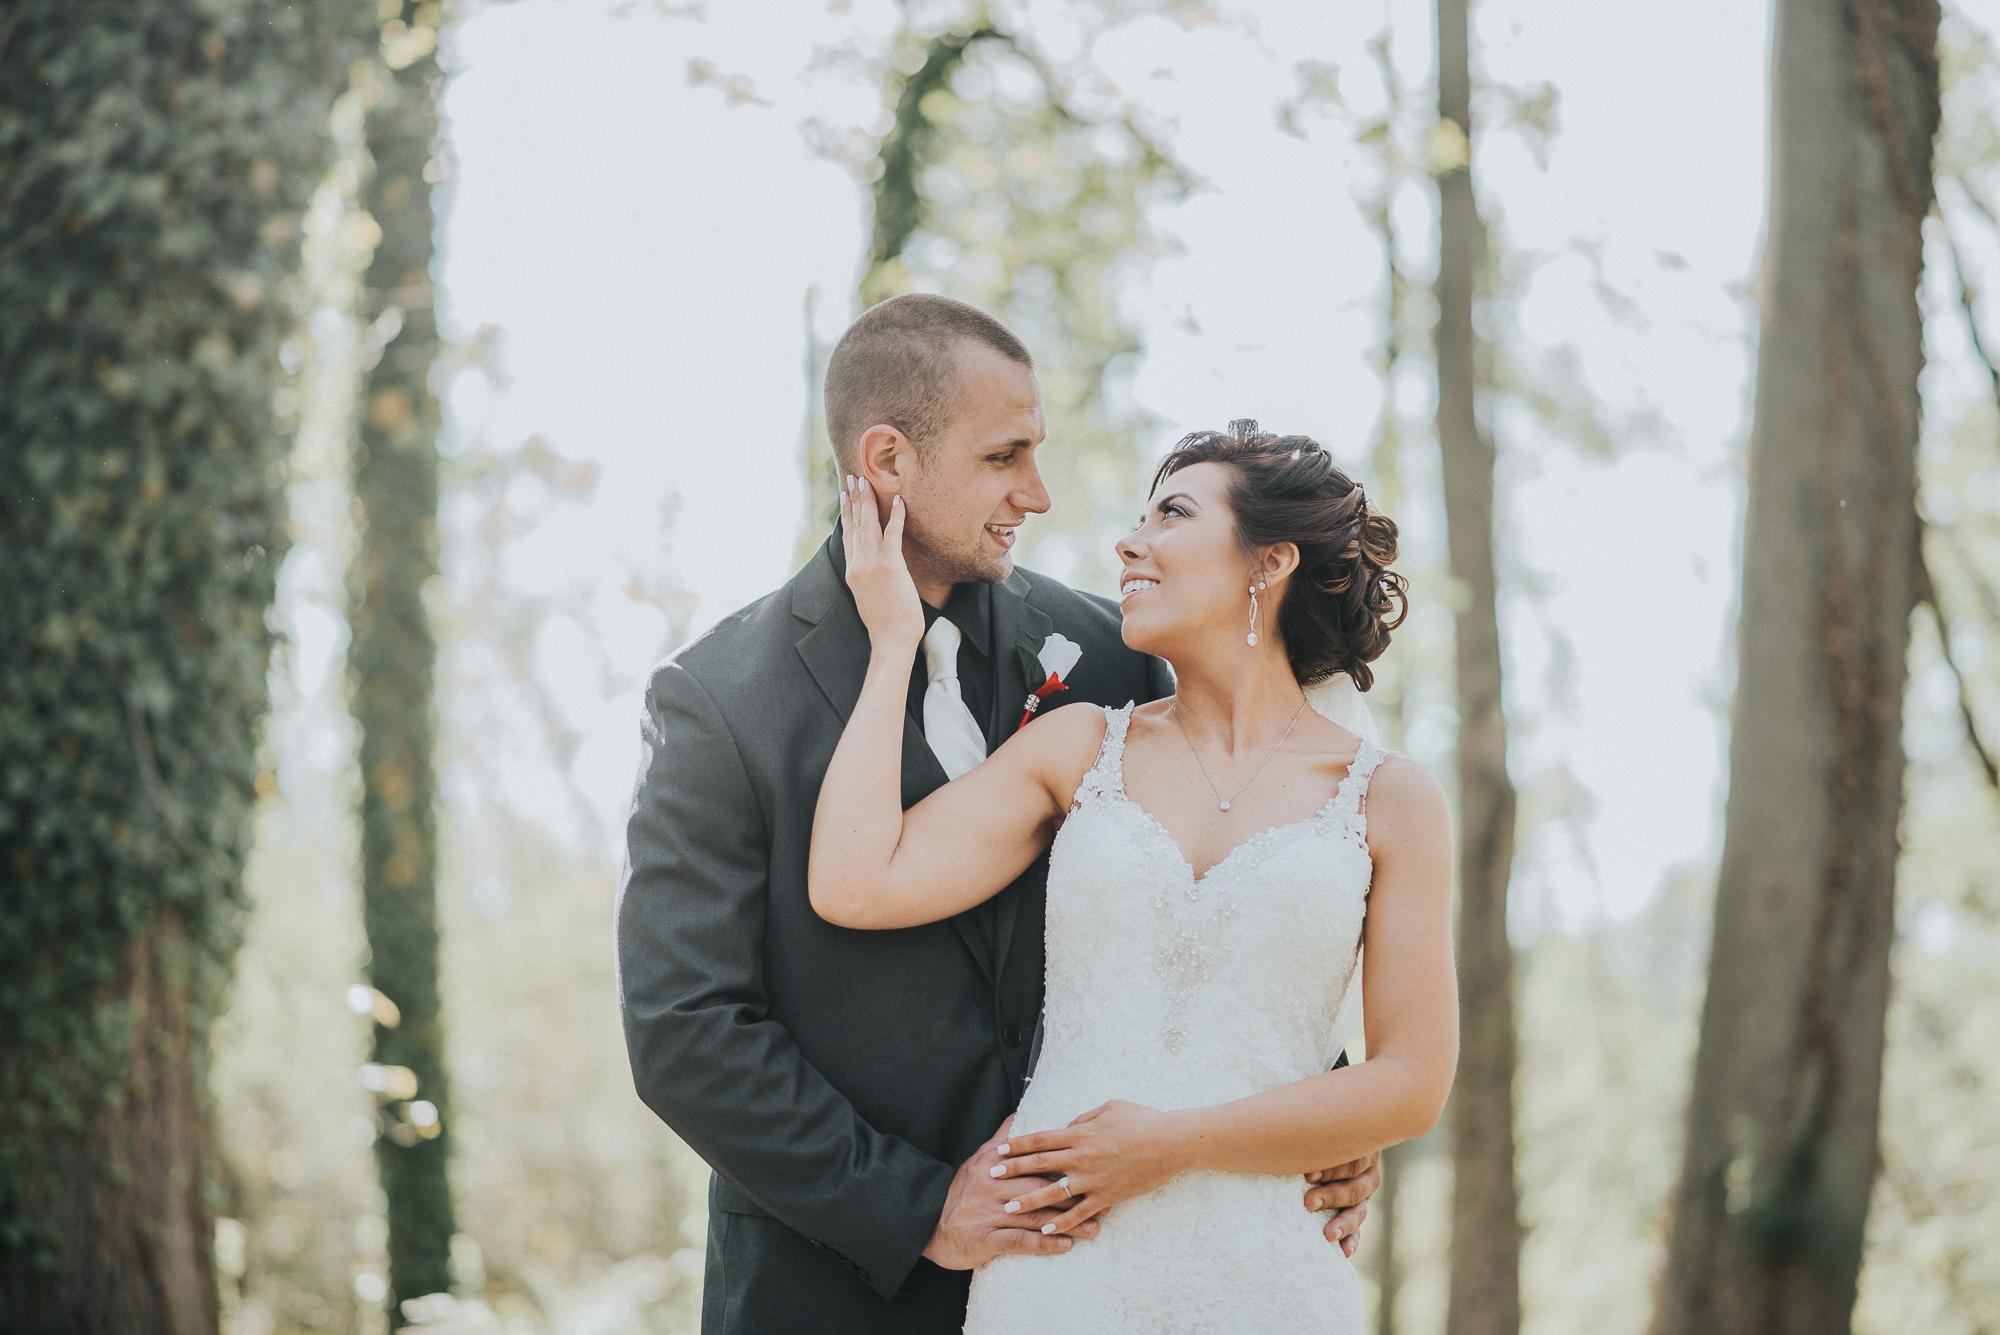 Christina-and-Gene-Wedding-Marla-Rain-Photography-178.jpg